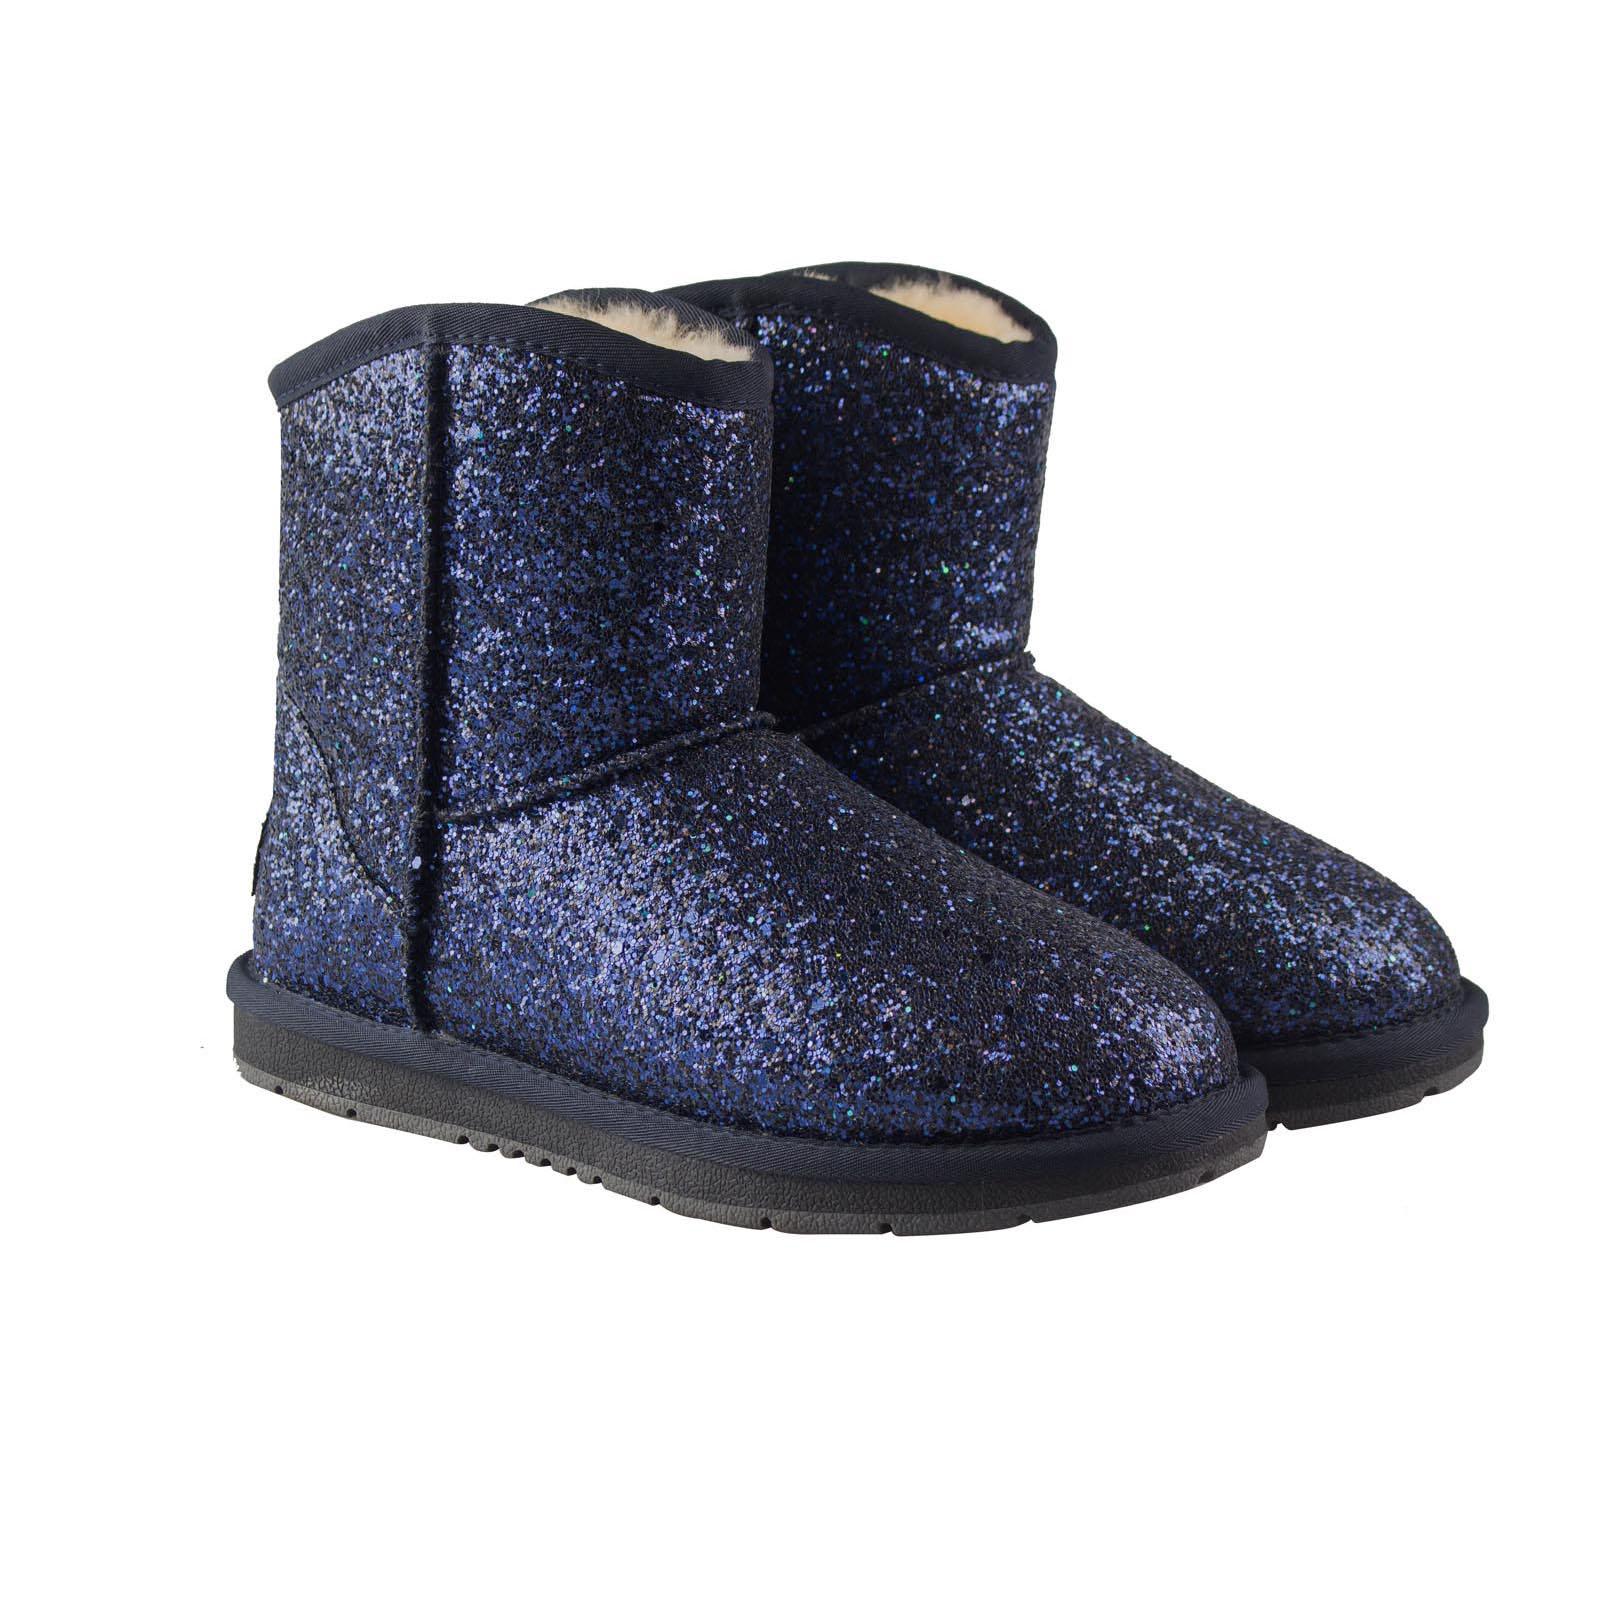 Ugg-Boots-Sheepskin-Short-Snowflake-Australian-Ladies-Black-